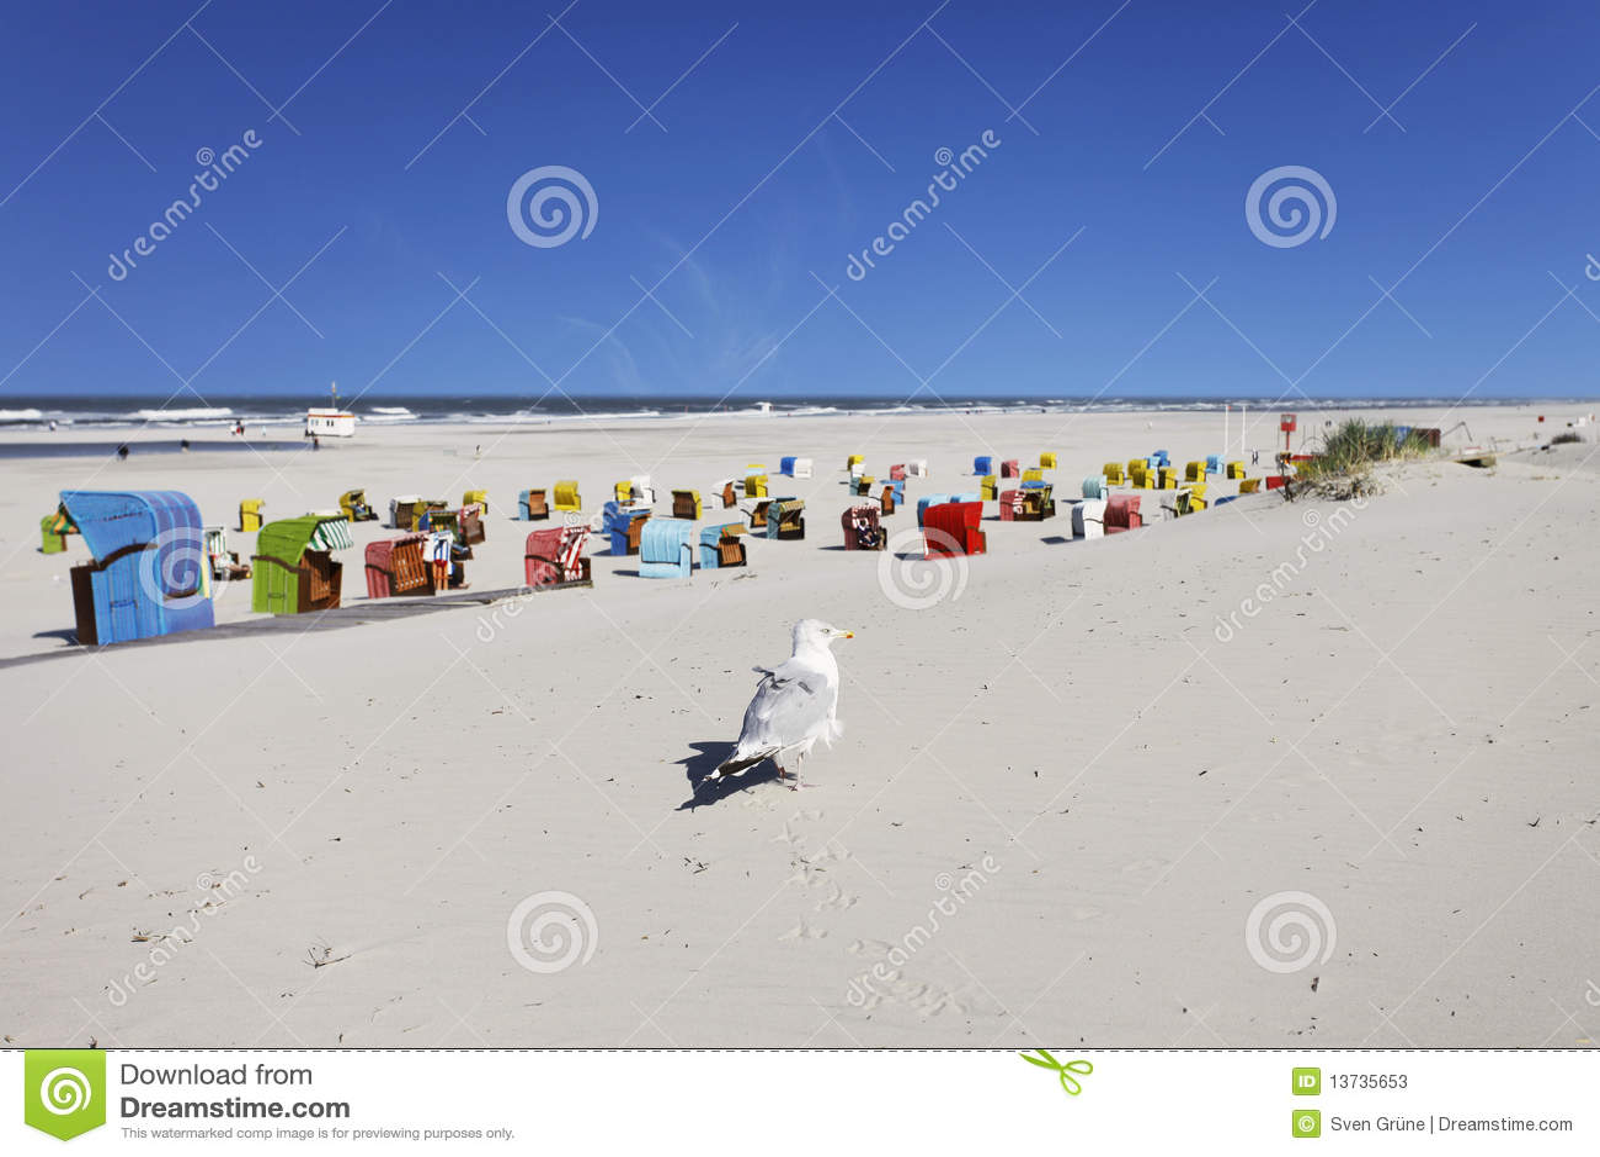 Beach of Juist